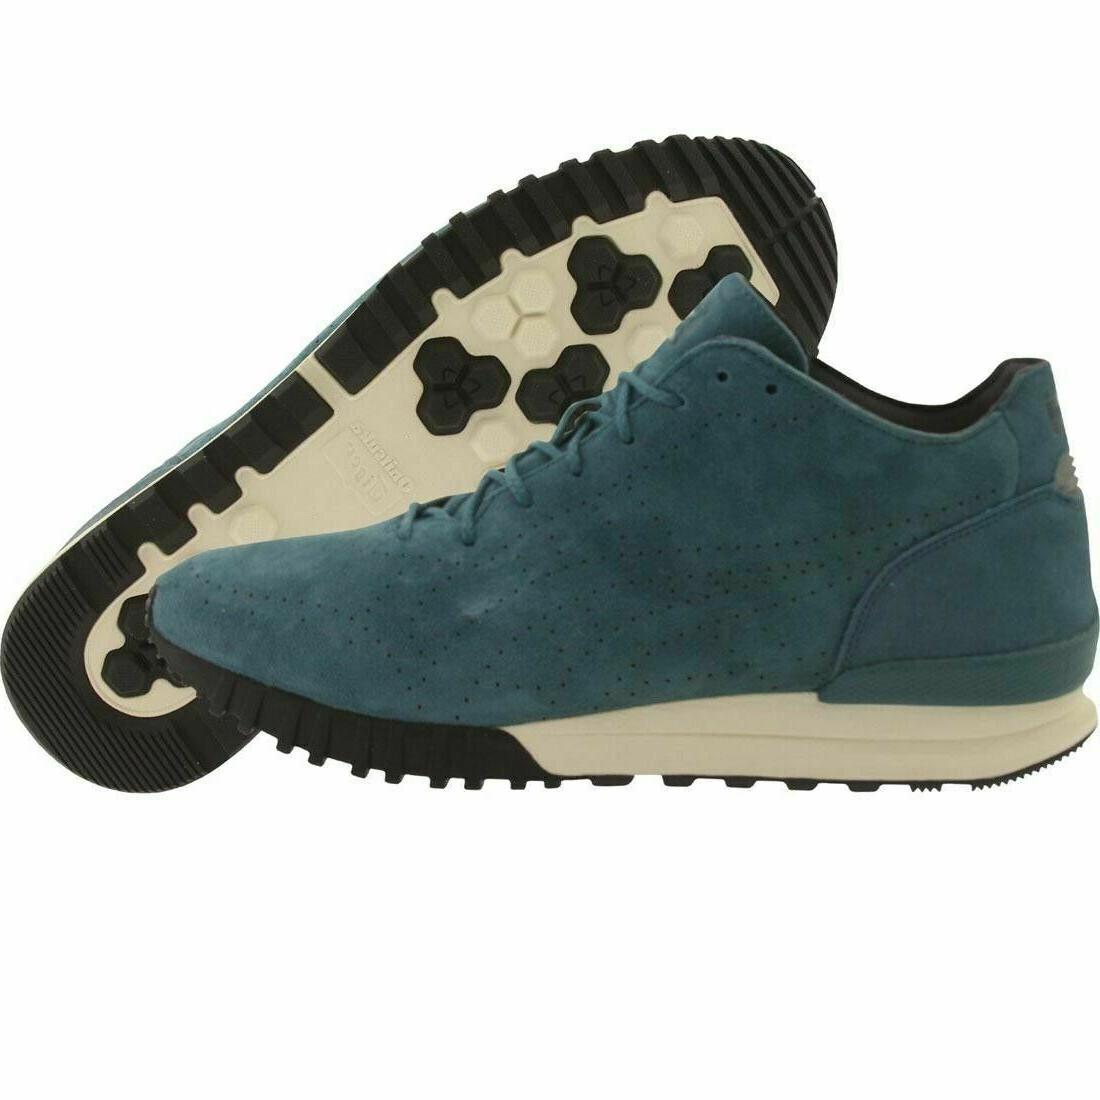 asics colorado eighty five men s sneakers